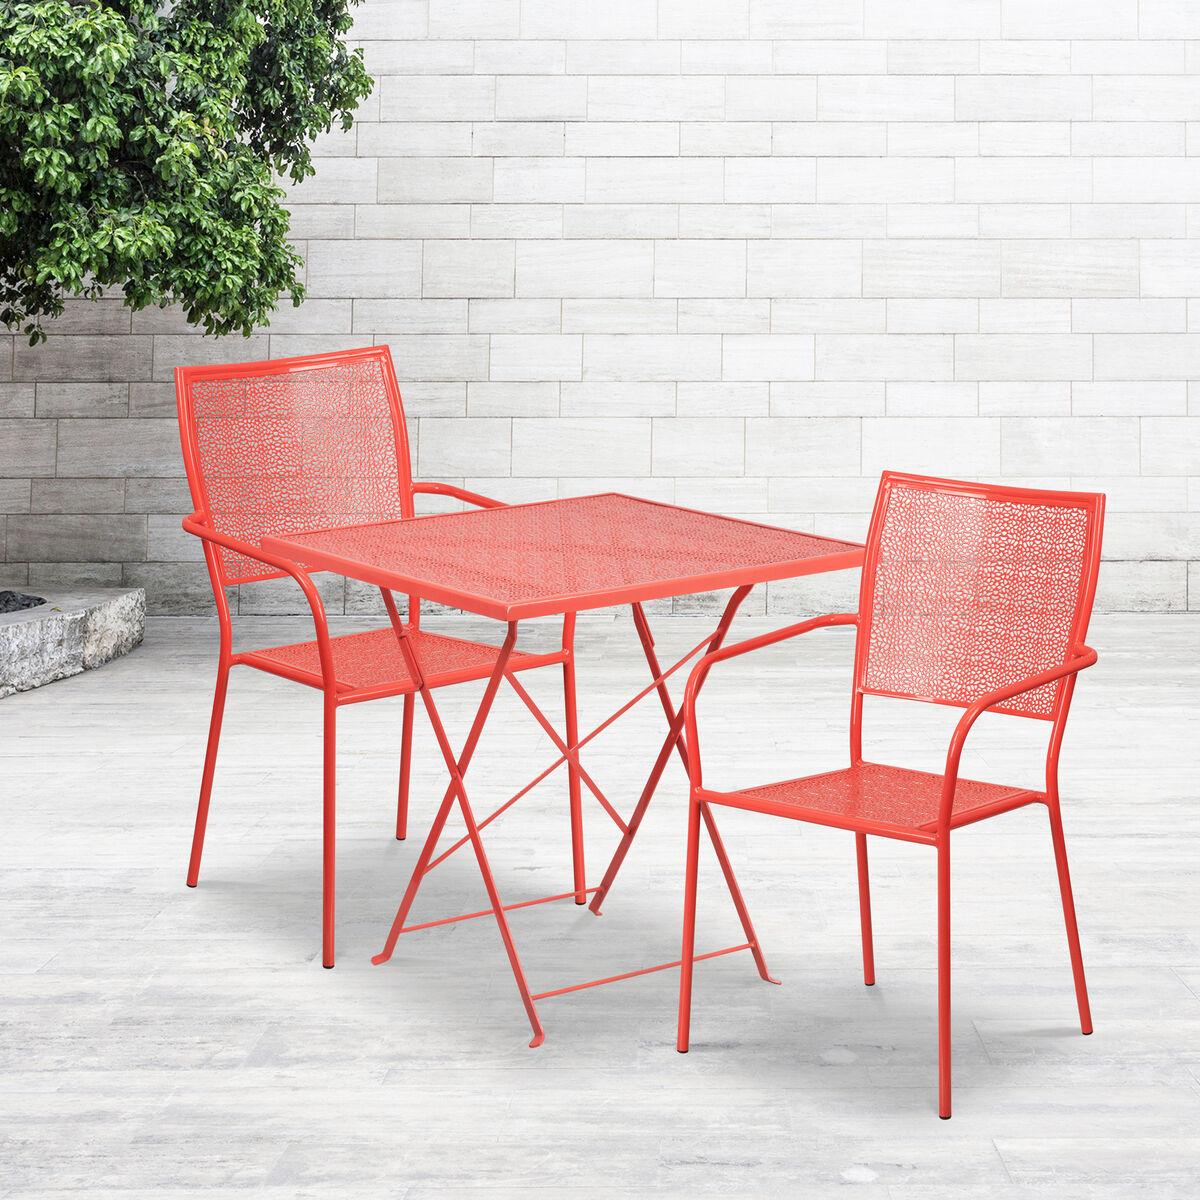 SQ Coral Fold Patio Set COSQFCHRREDGG Bizchaircom - Metal folding patio table and chairs